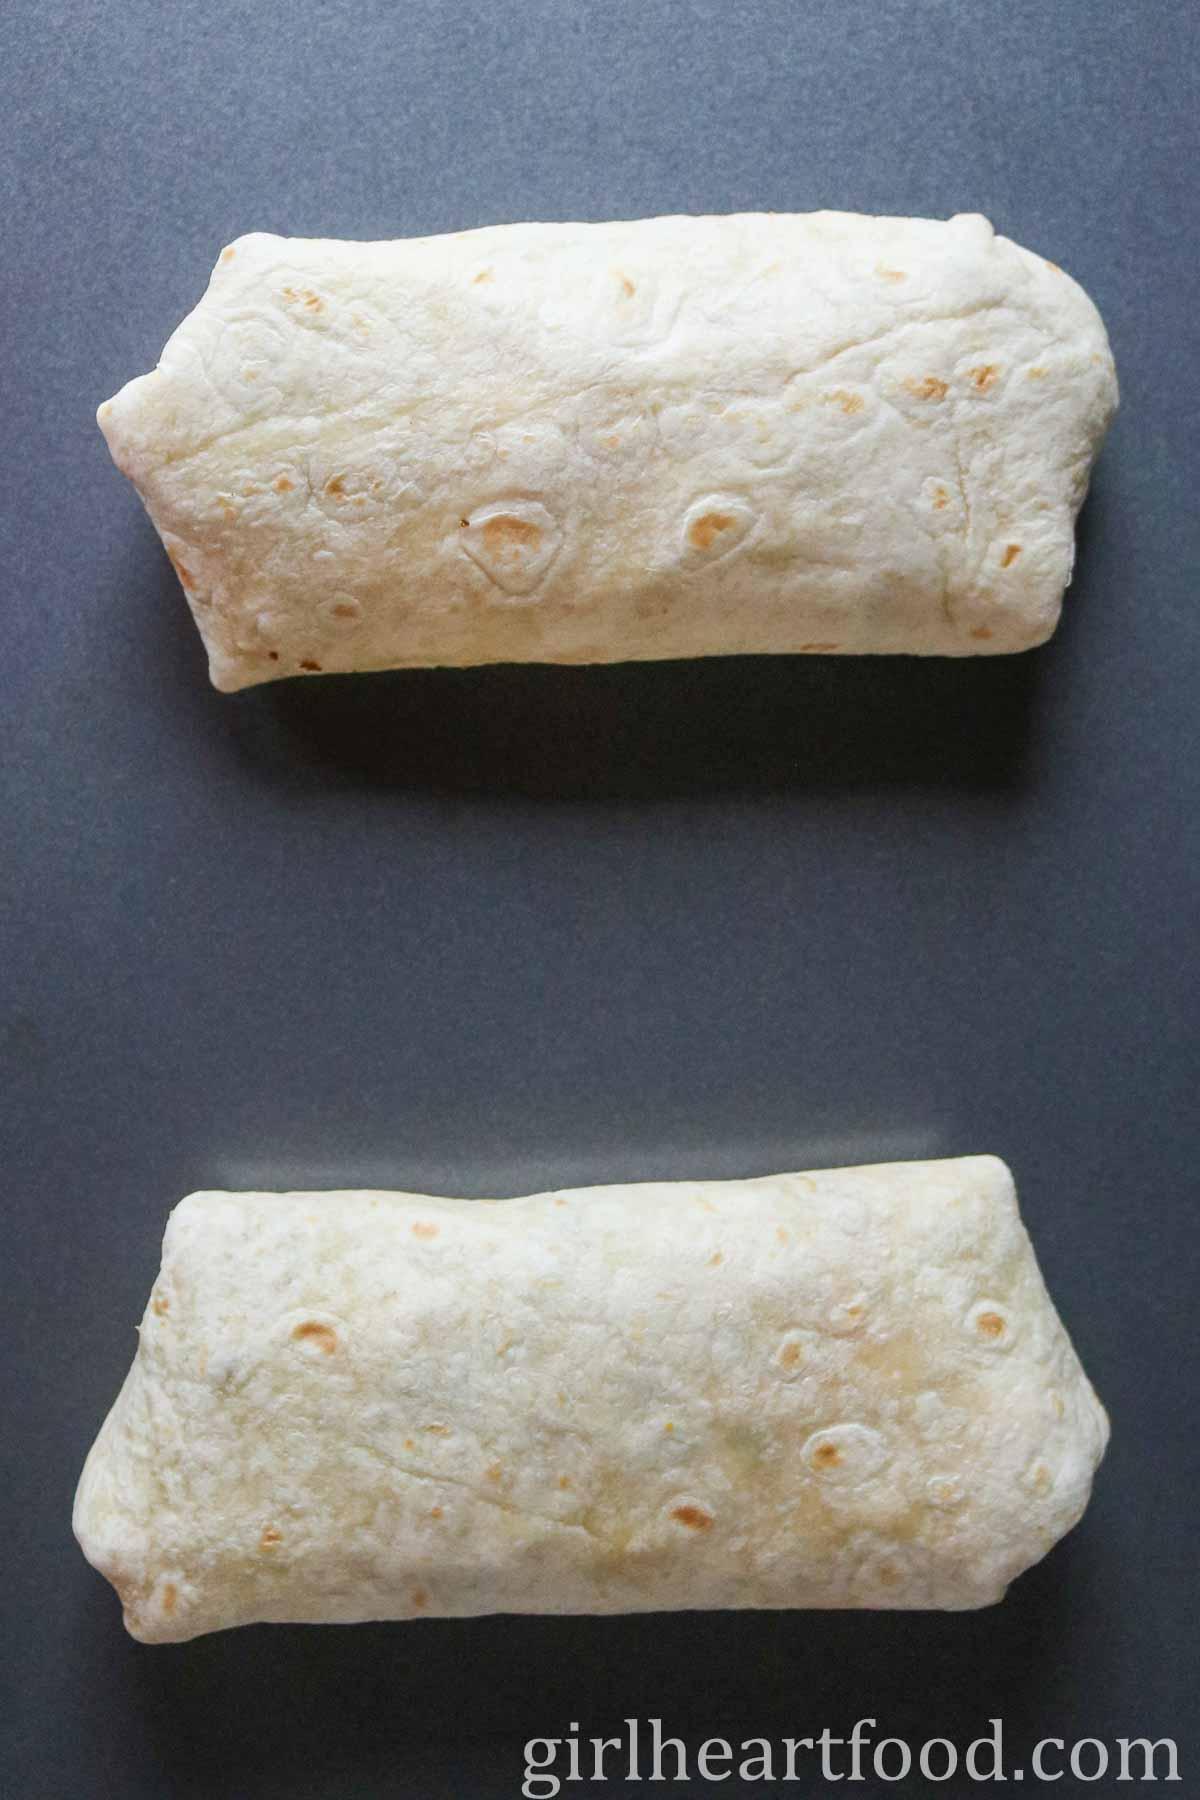 Two wraps on a sheet pan.